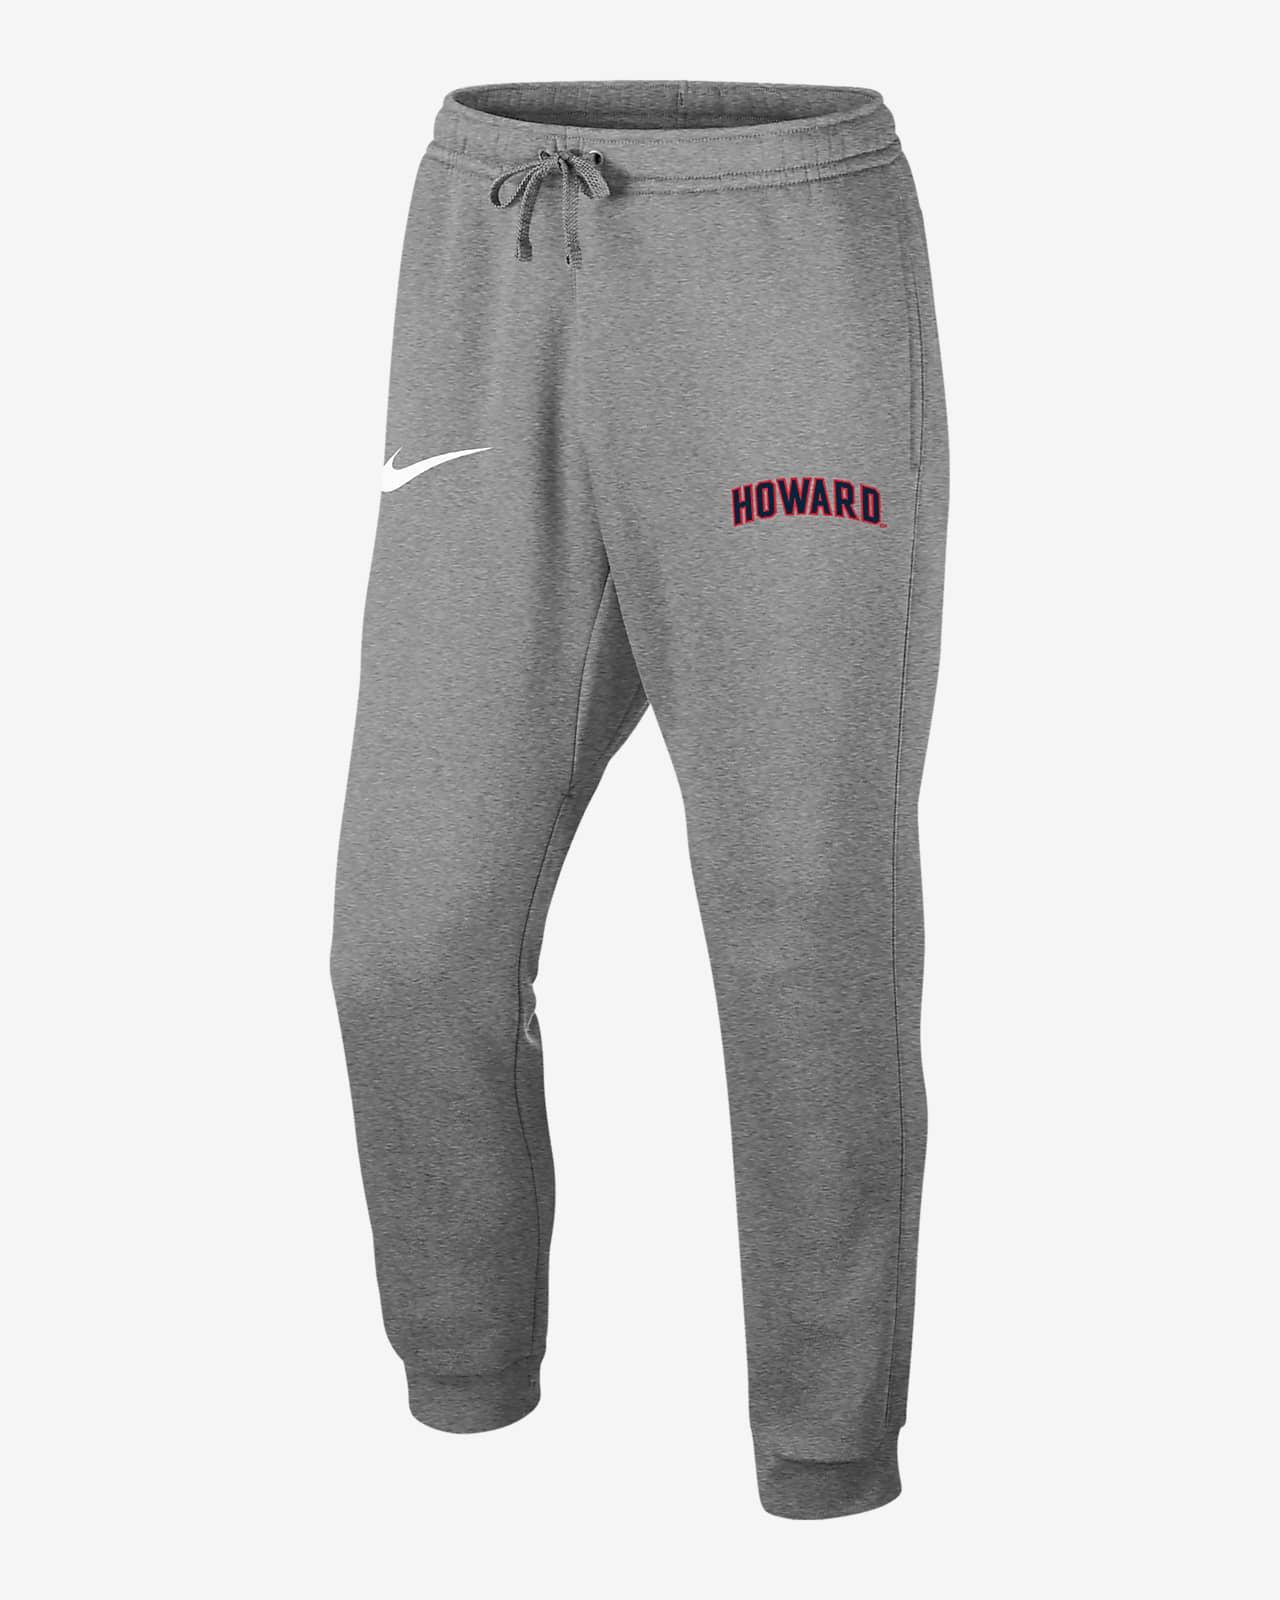 Nike College Club Fleece (Howard) Joggers